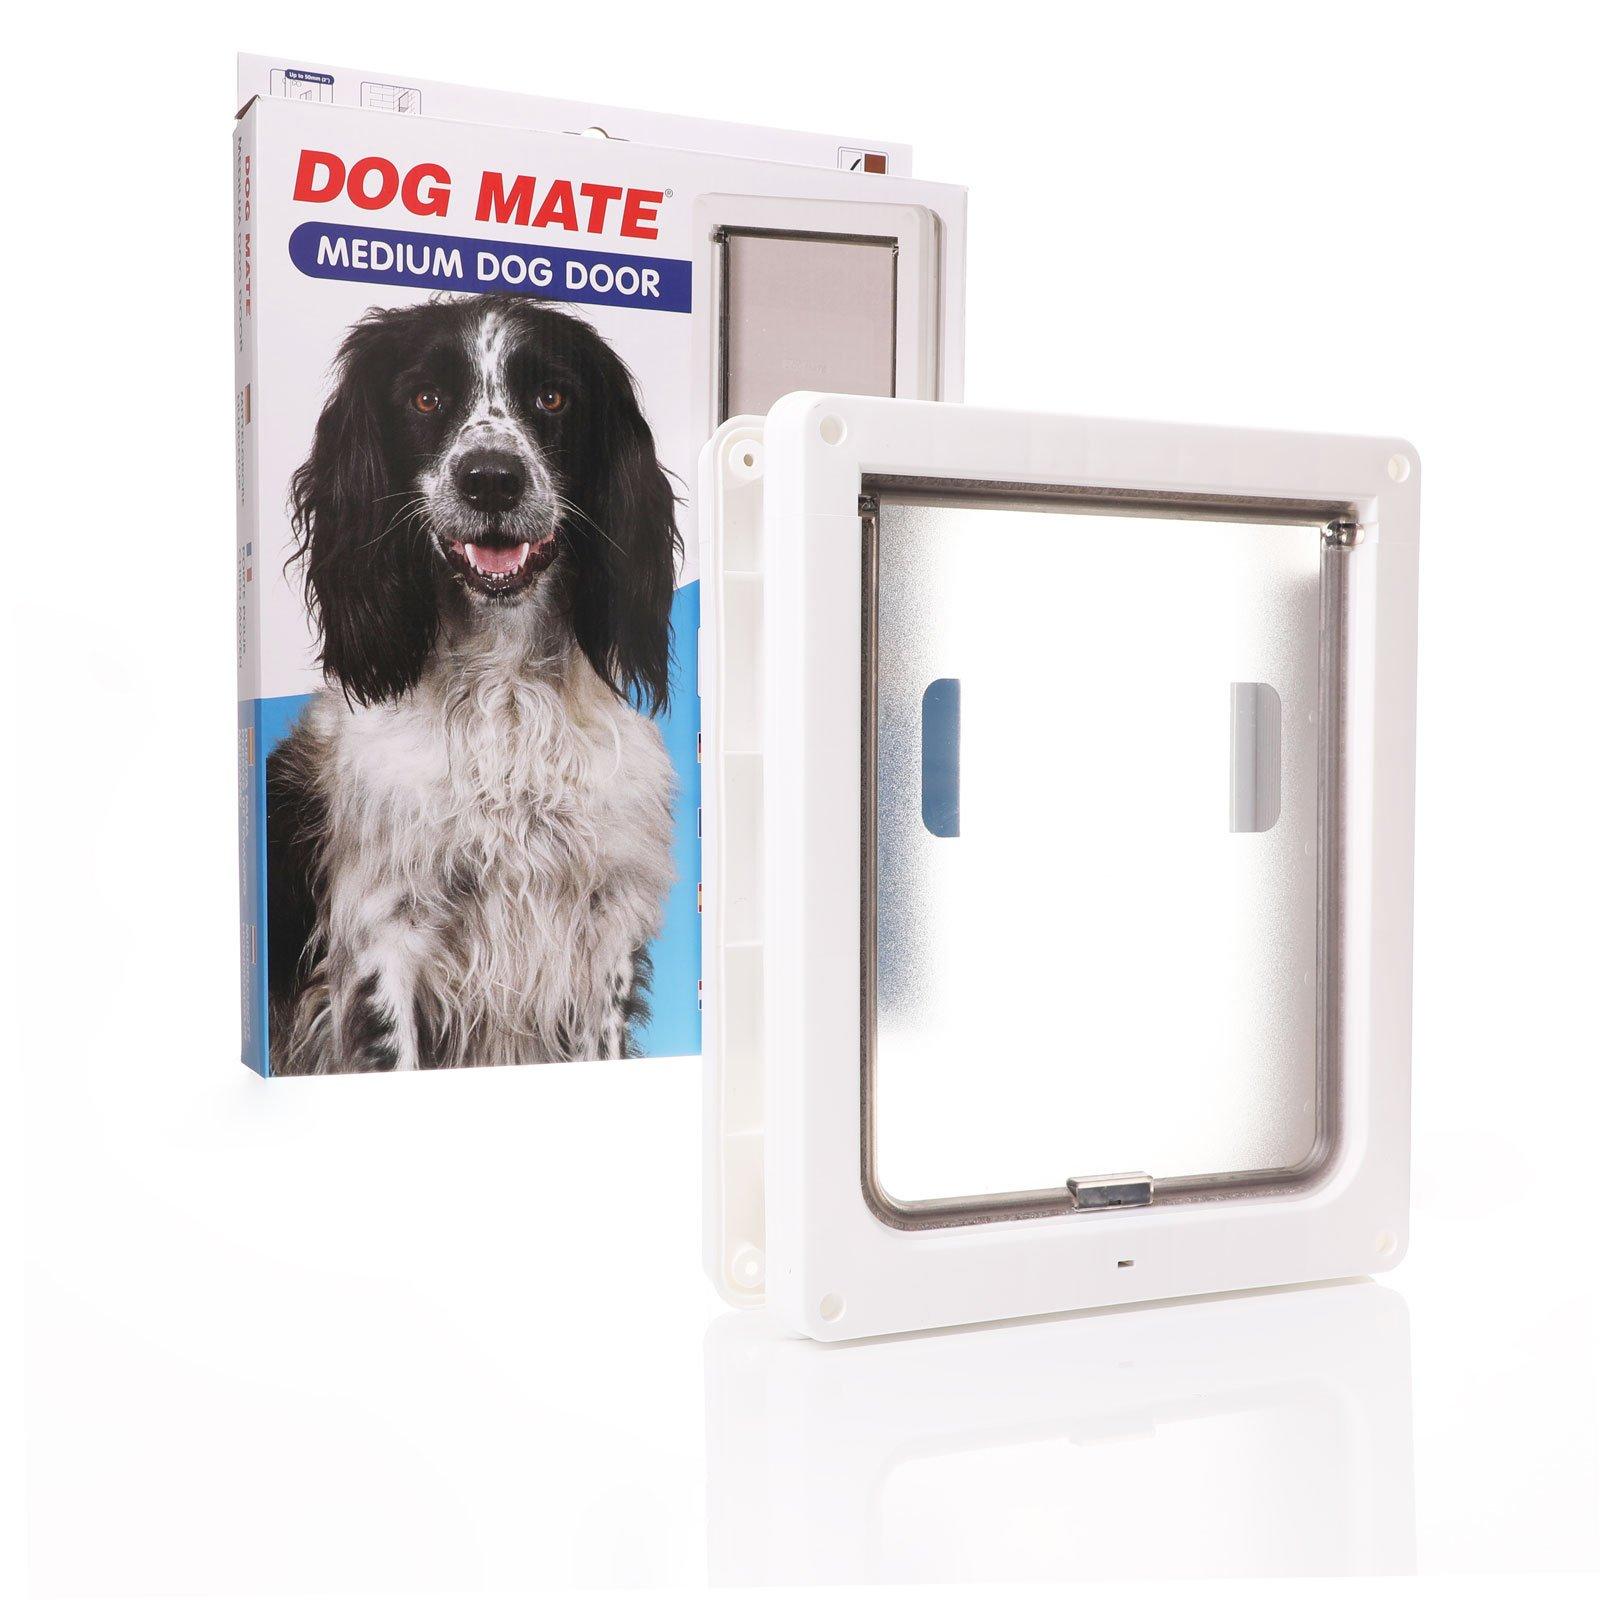 Medium small dog door white frame clear flap.